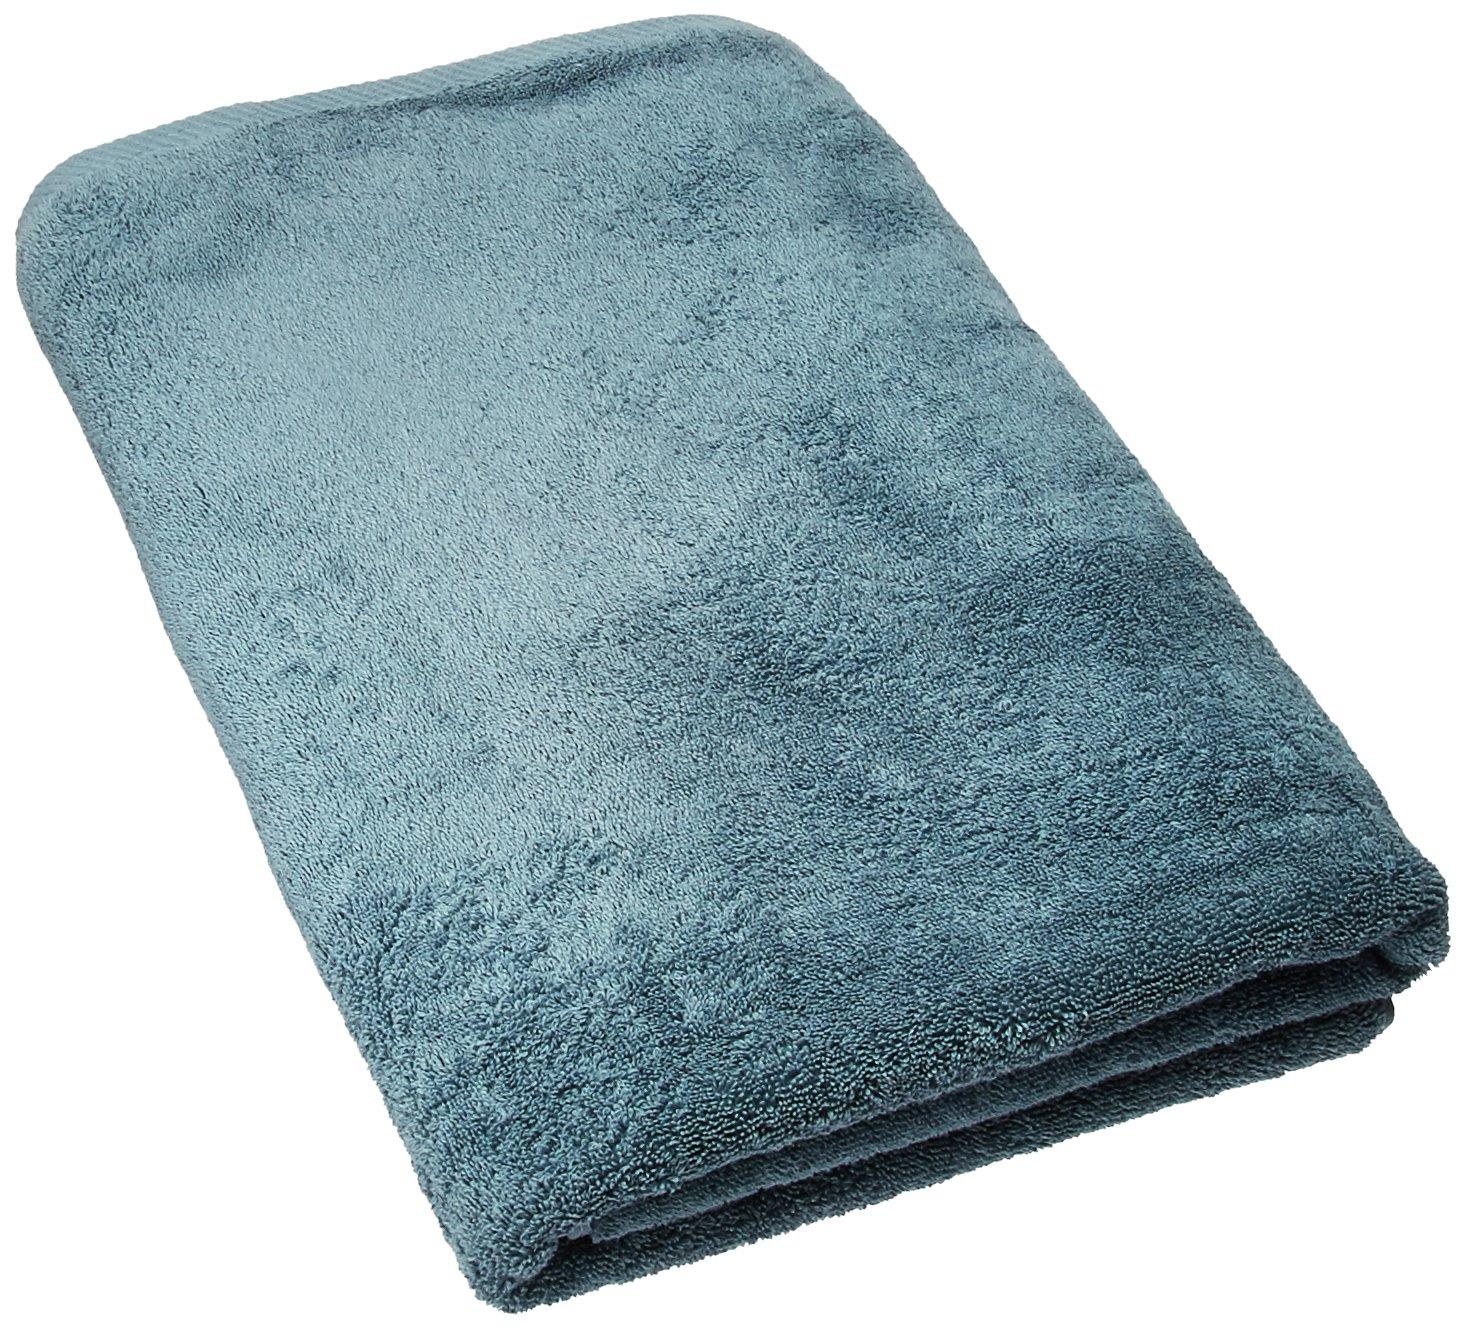 Extra Large Turkuoise Premium Quality Bath Sheet 100/% Turkish Cotton White, 40x80 Inches